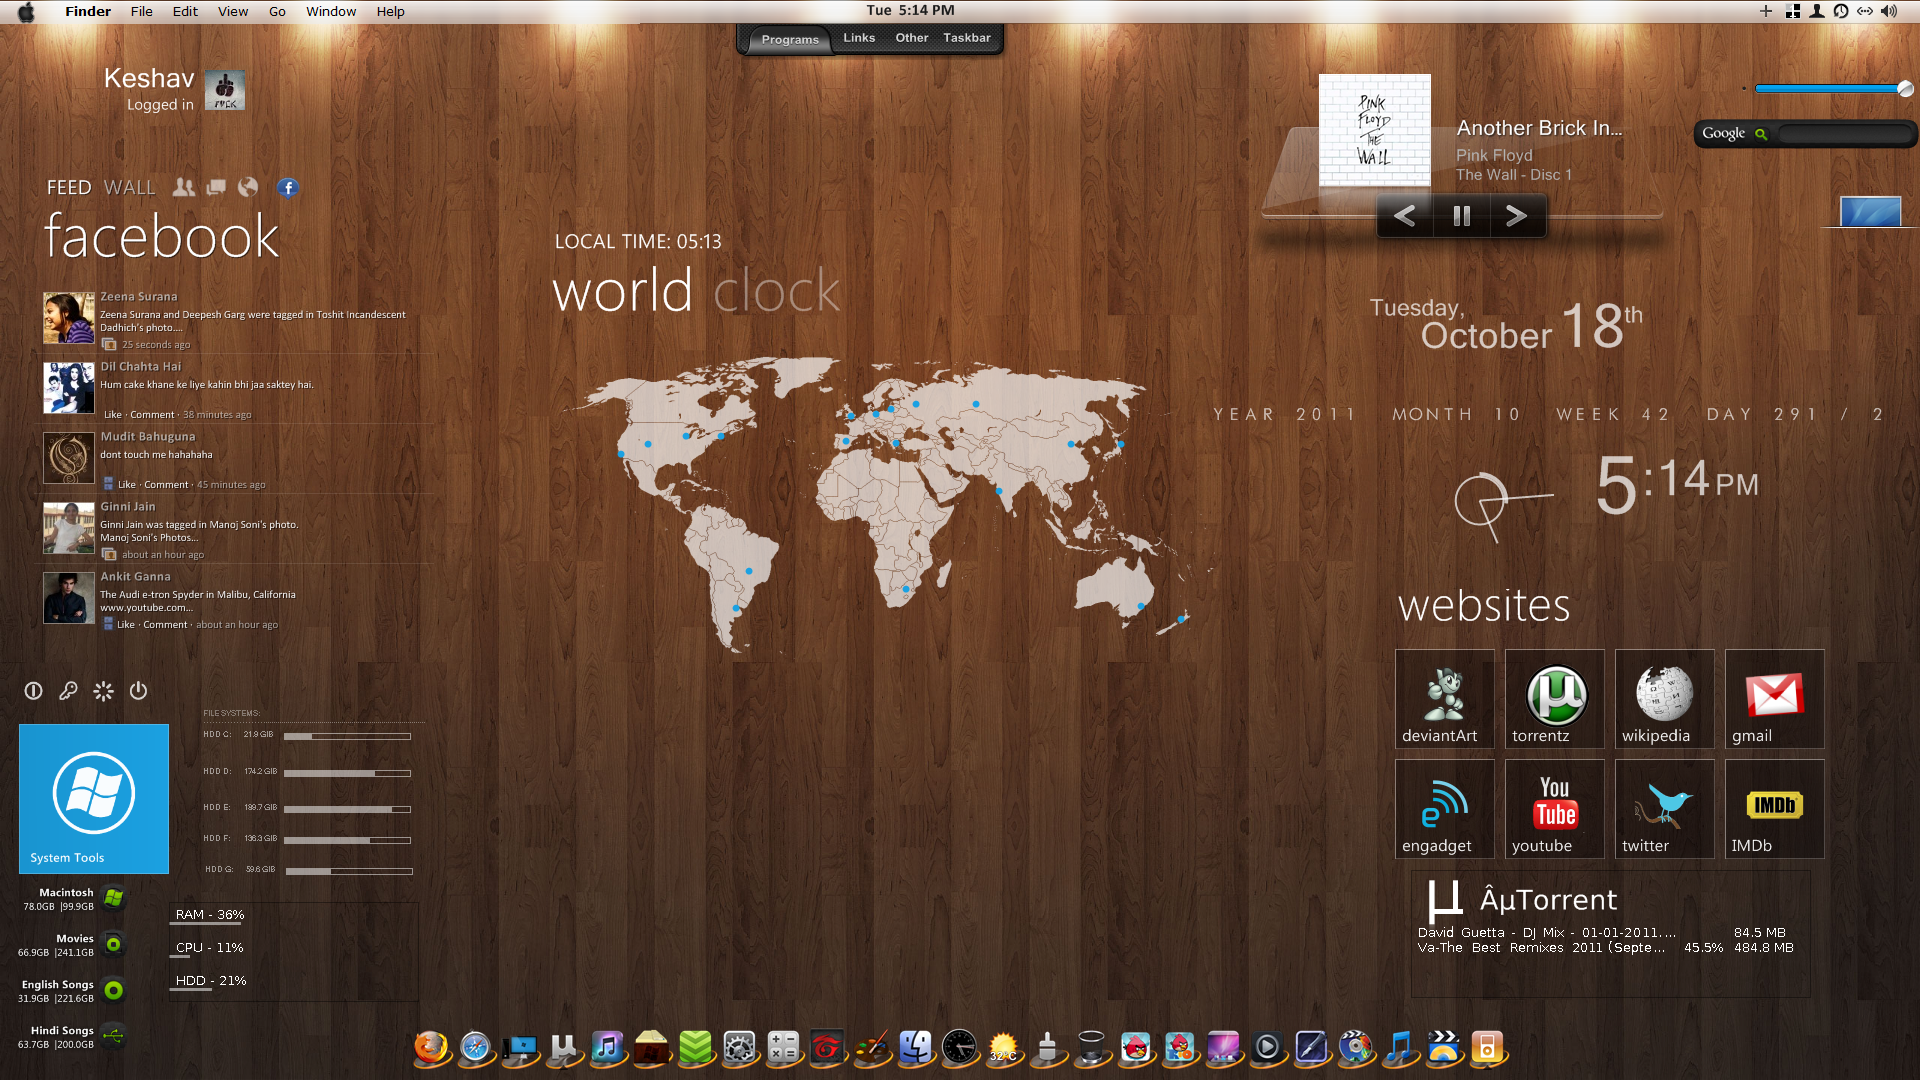 best theme for windows 7 32 bit